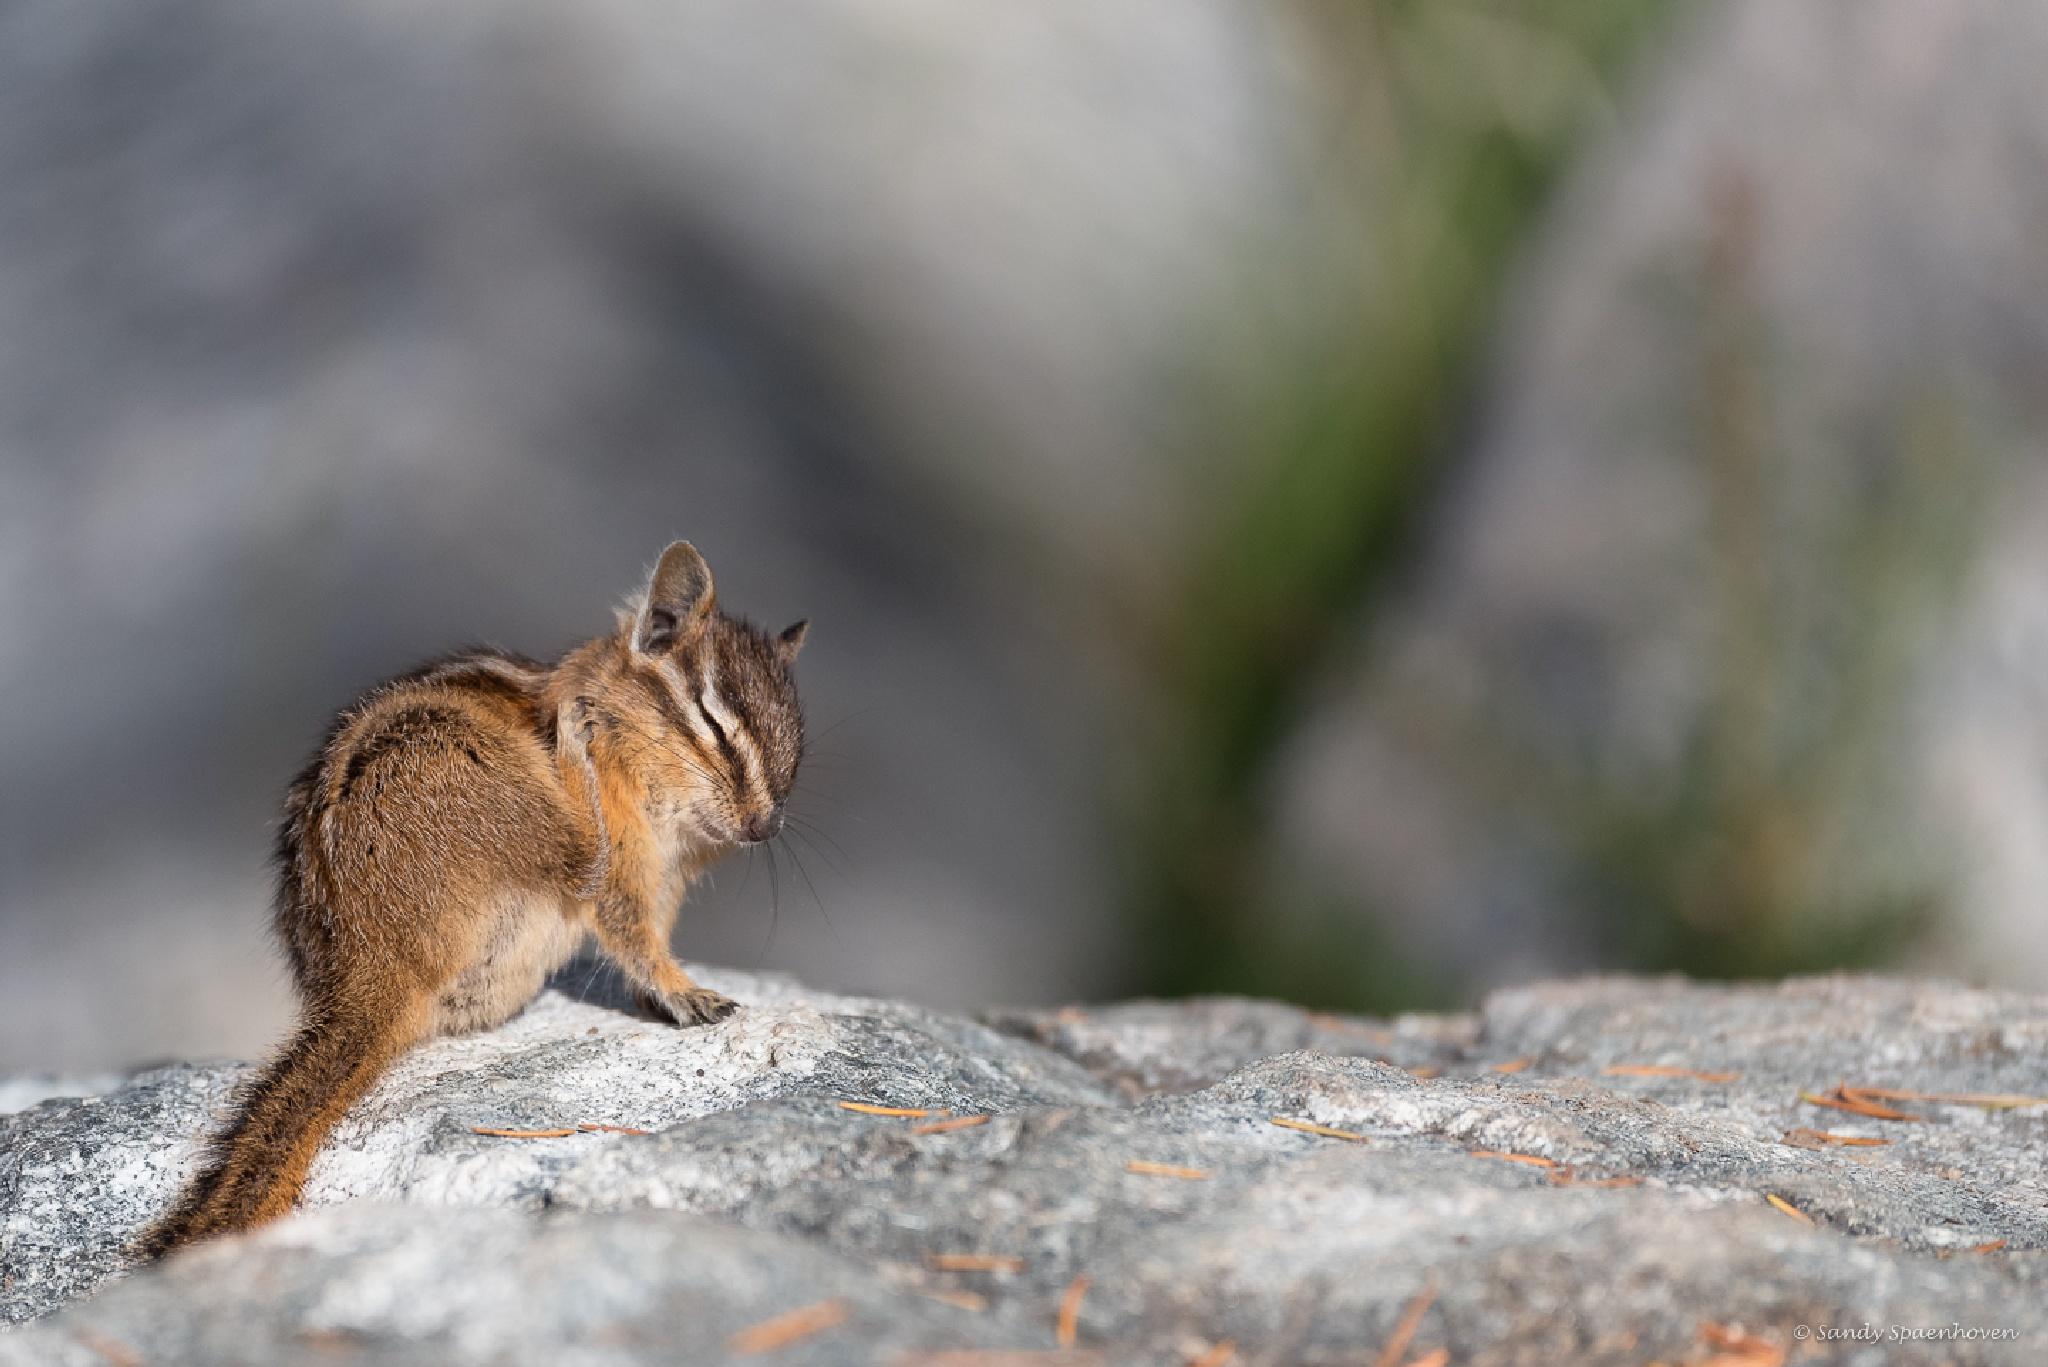 Chipmunk by Sandy Spaenhoven